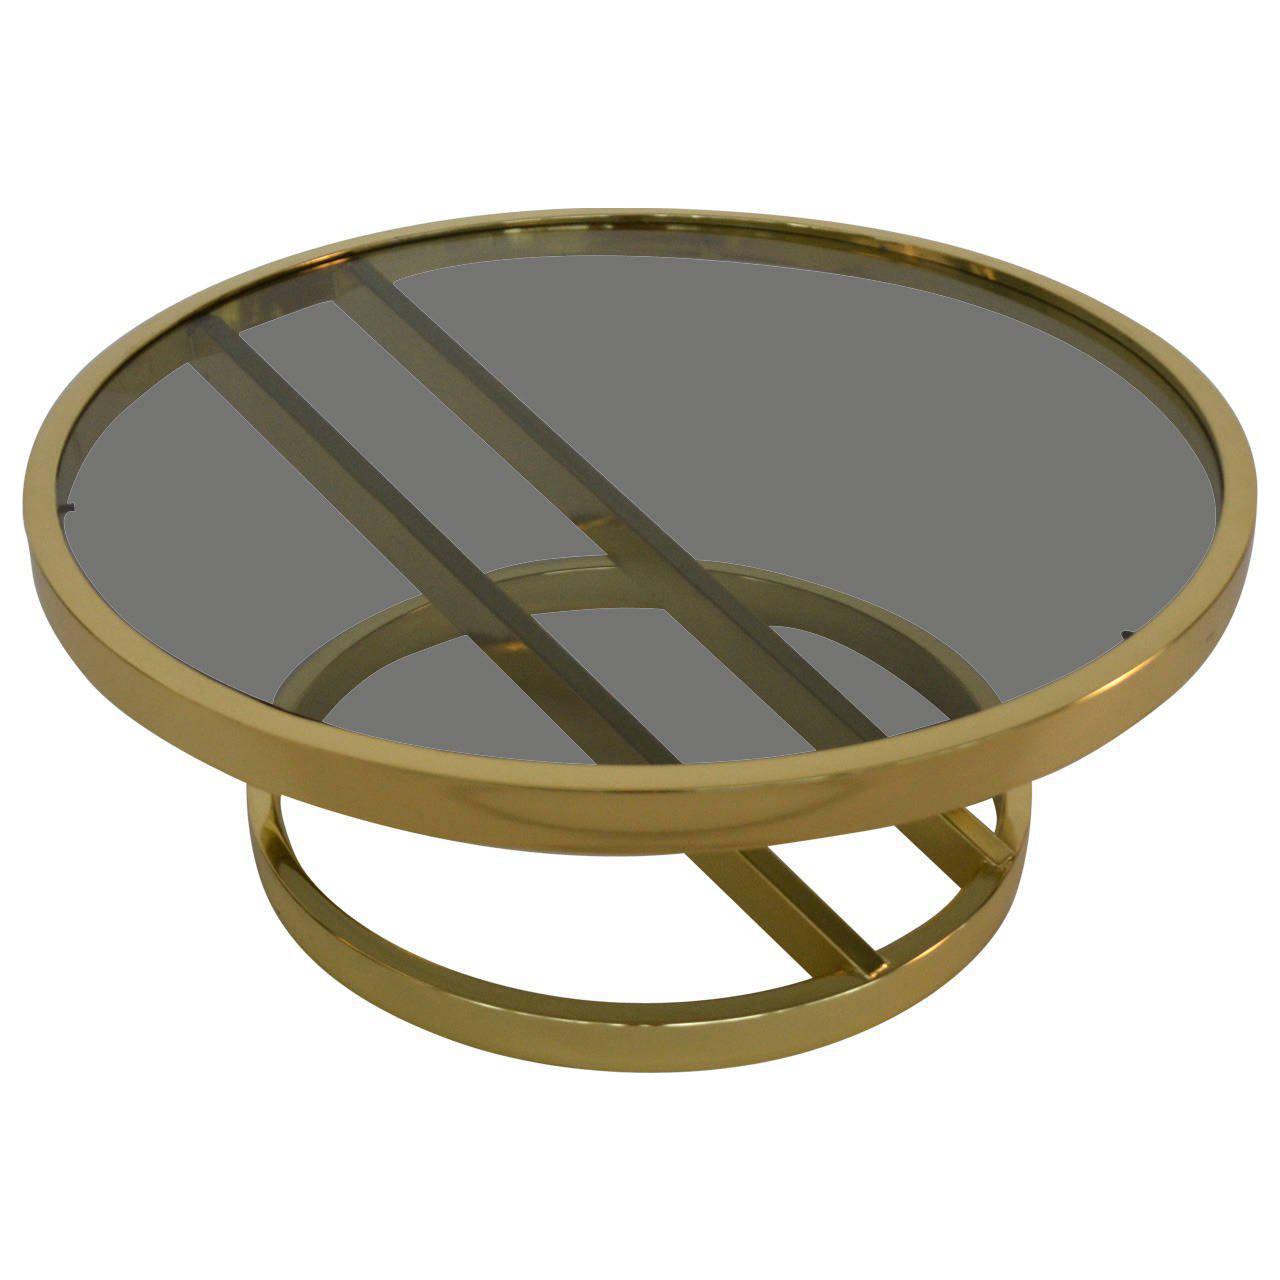 Milo Baughman Mid Century Modern Zig Zag Based Glass Coffee Table Chairish